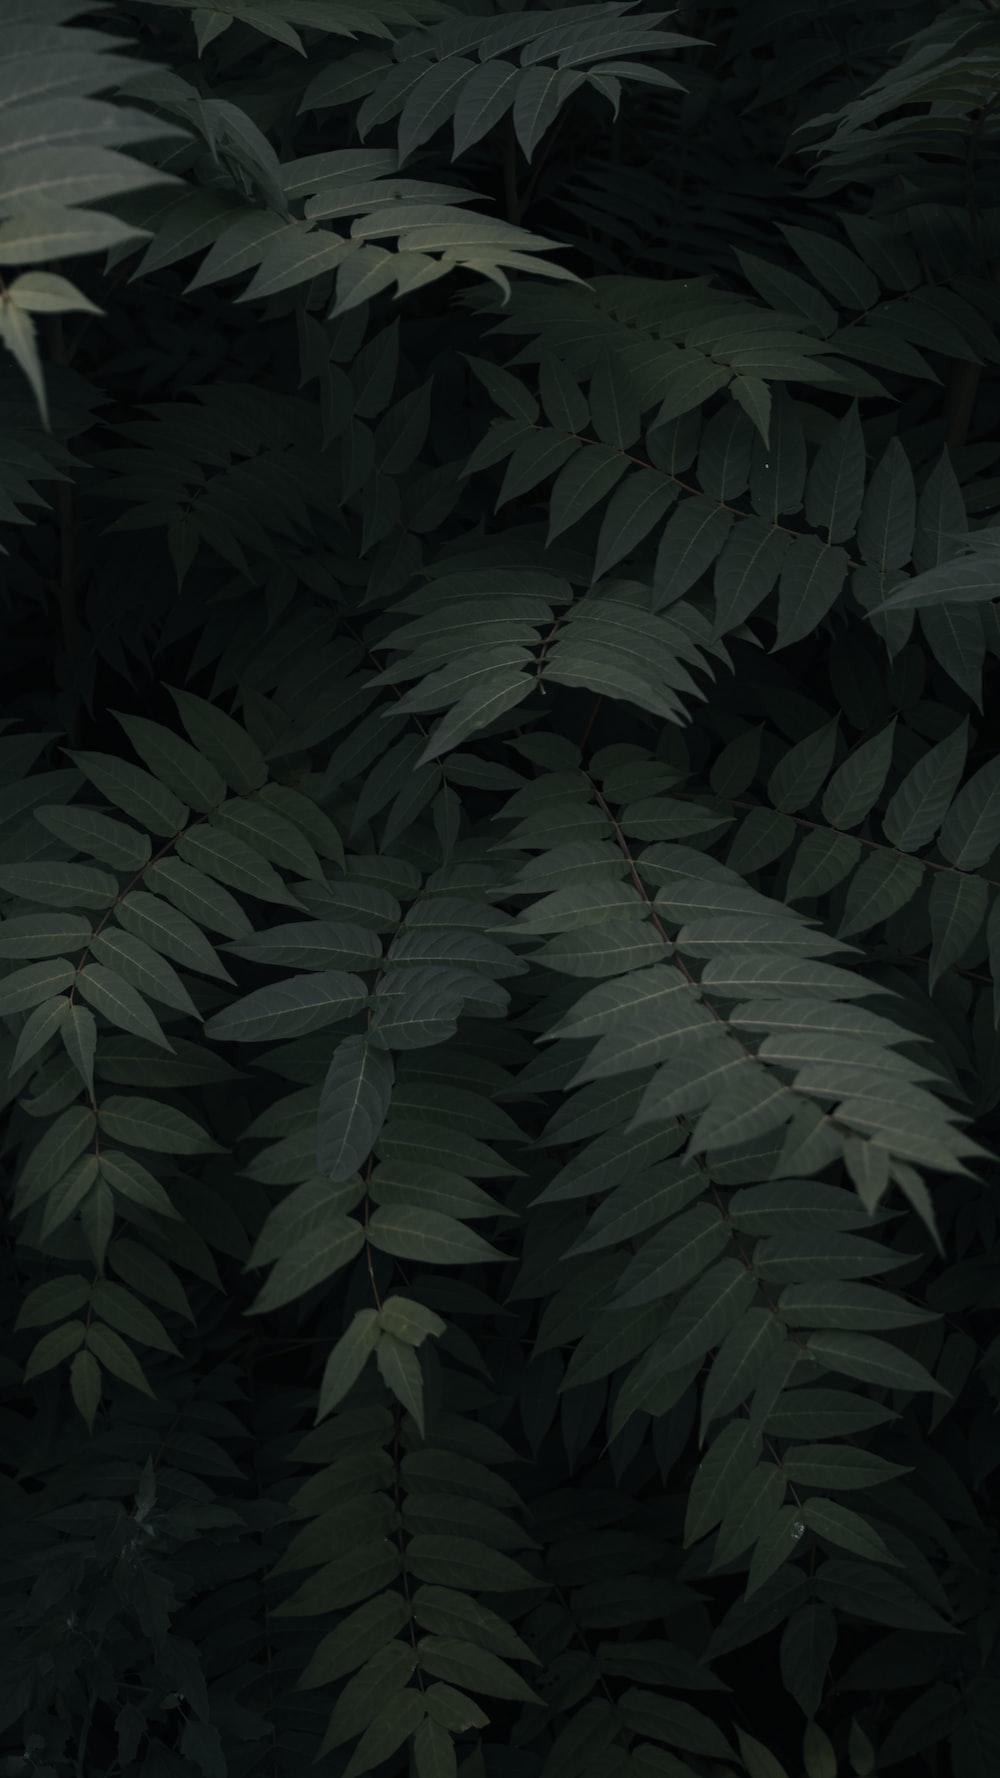 green leefed plants